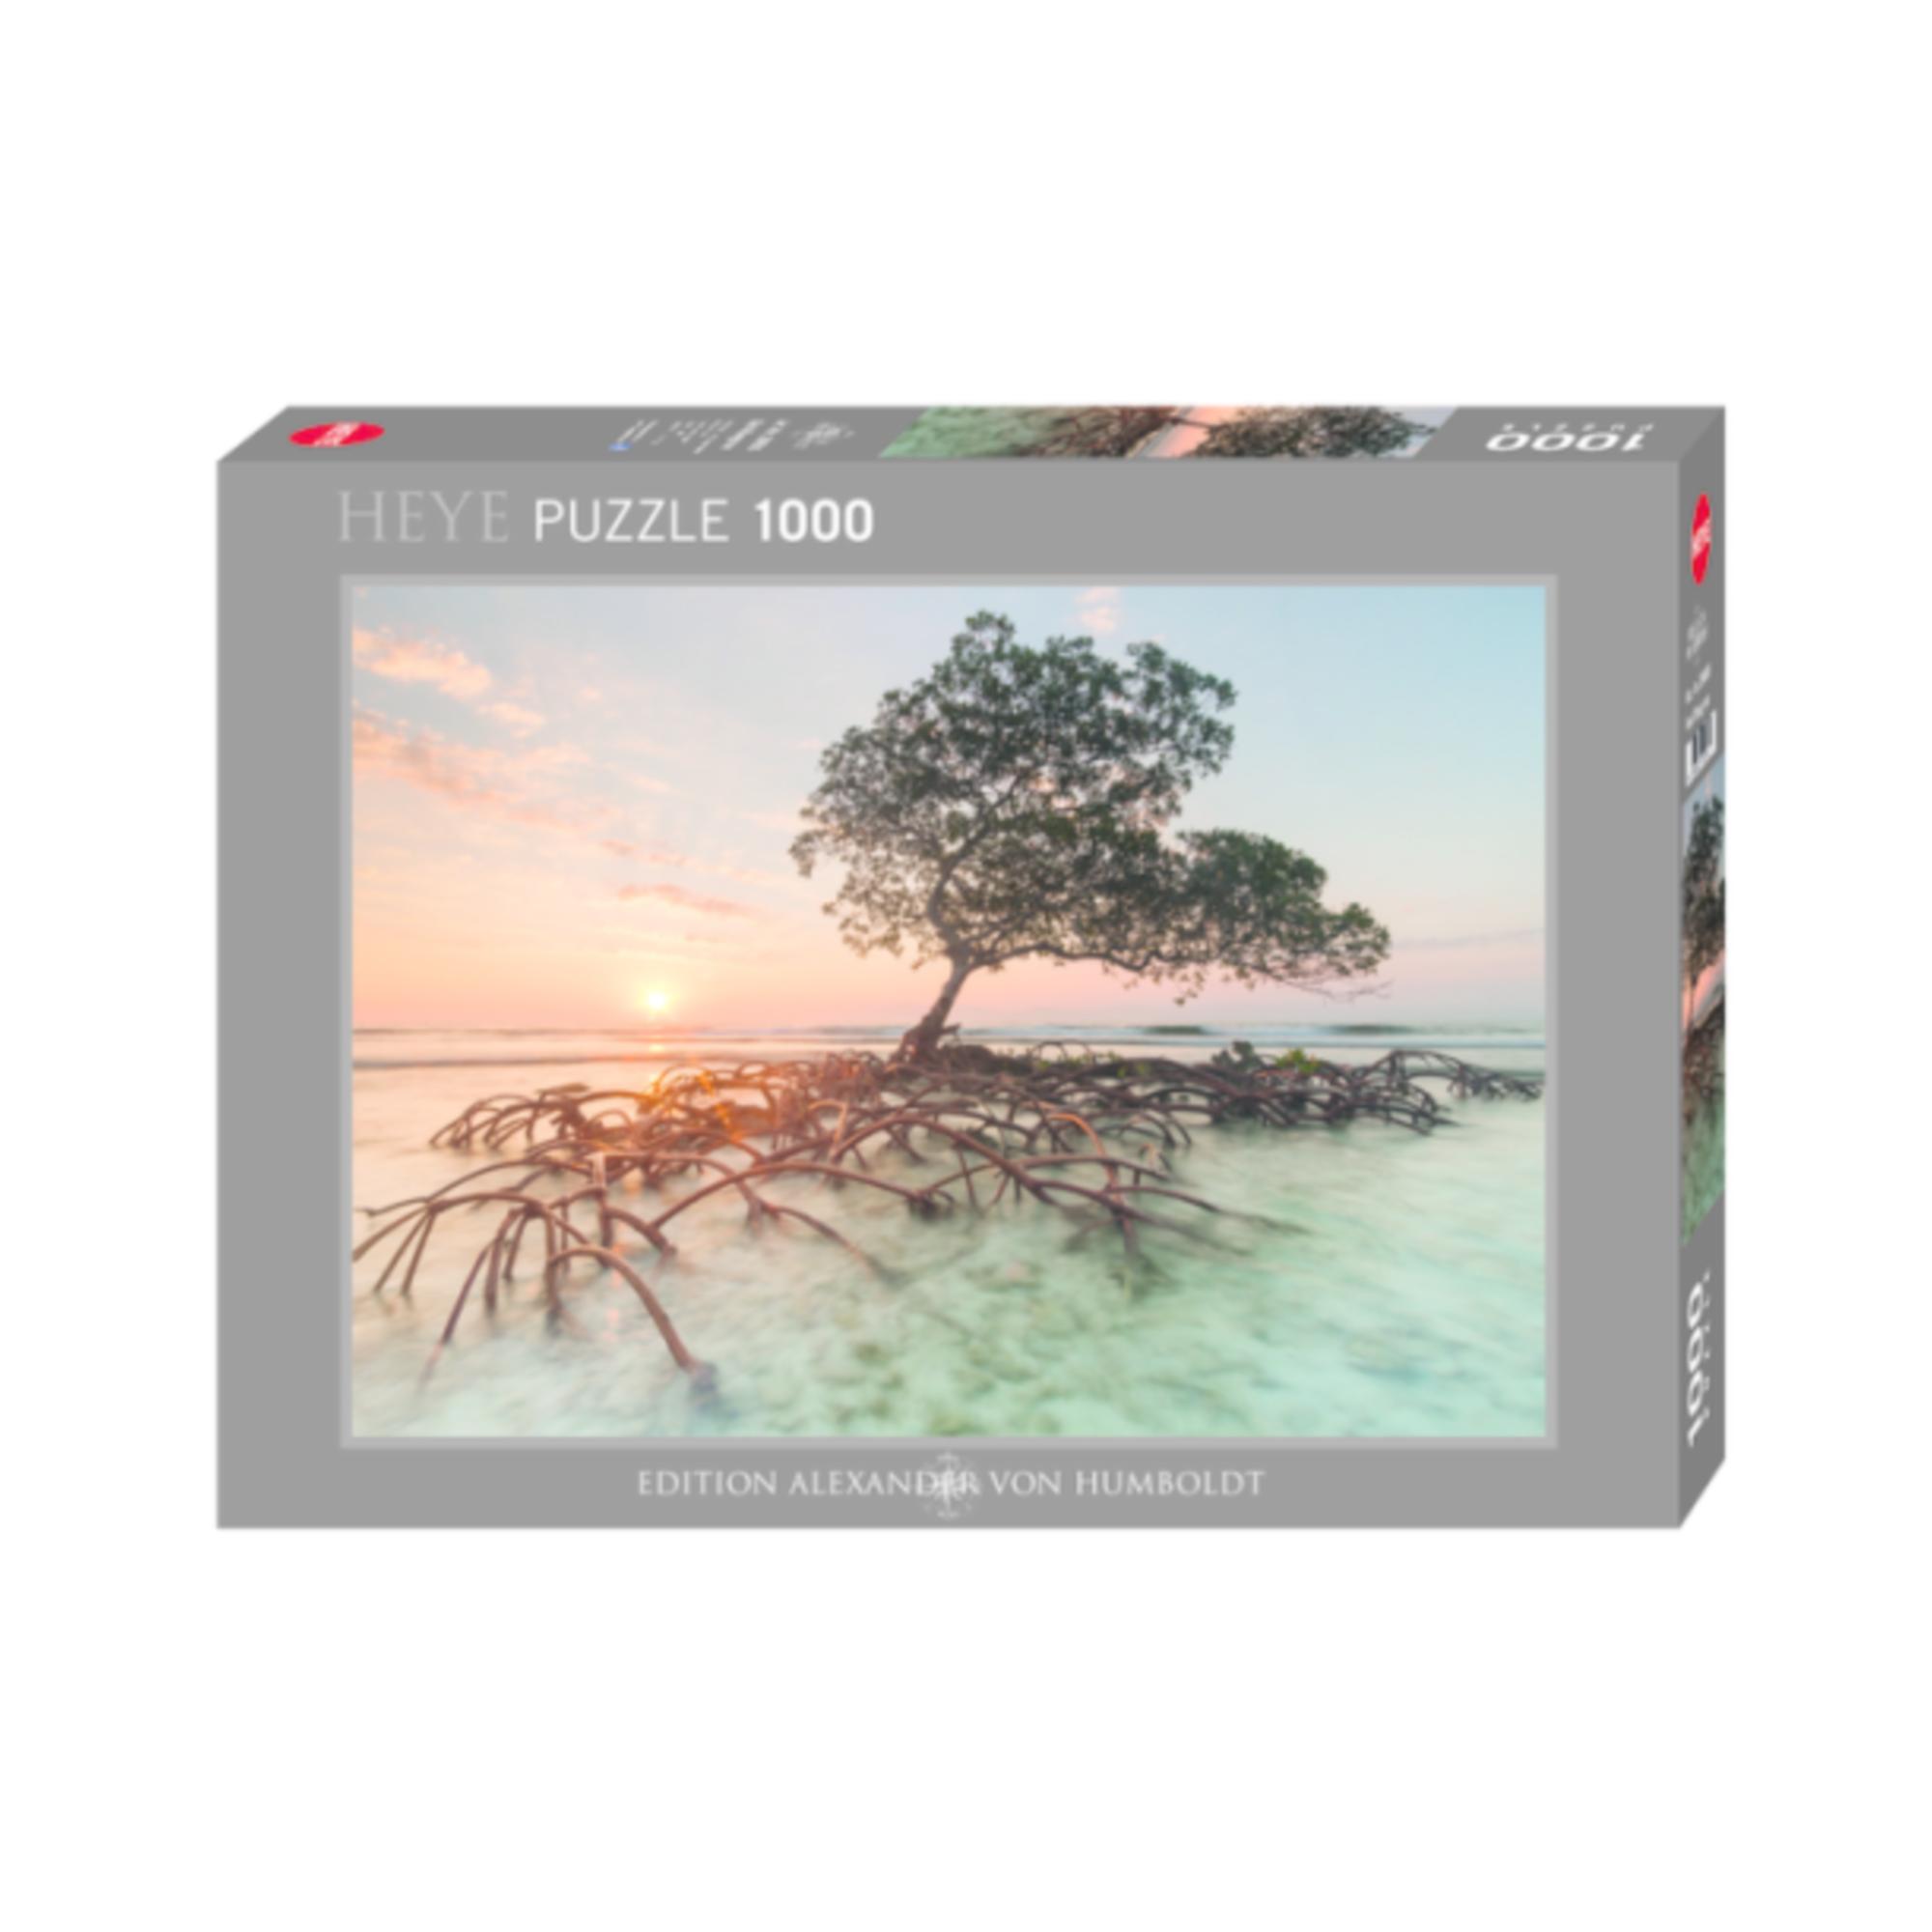 Heye Puzzle 1000: Red Mangrove